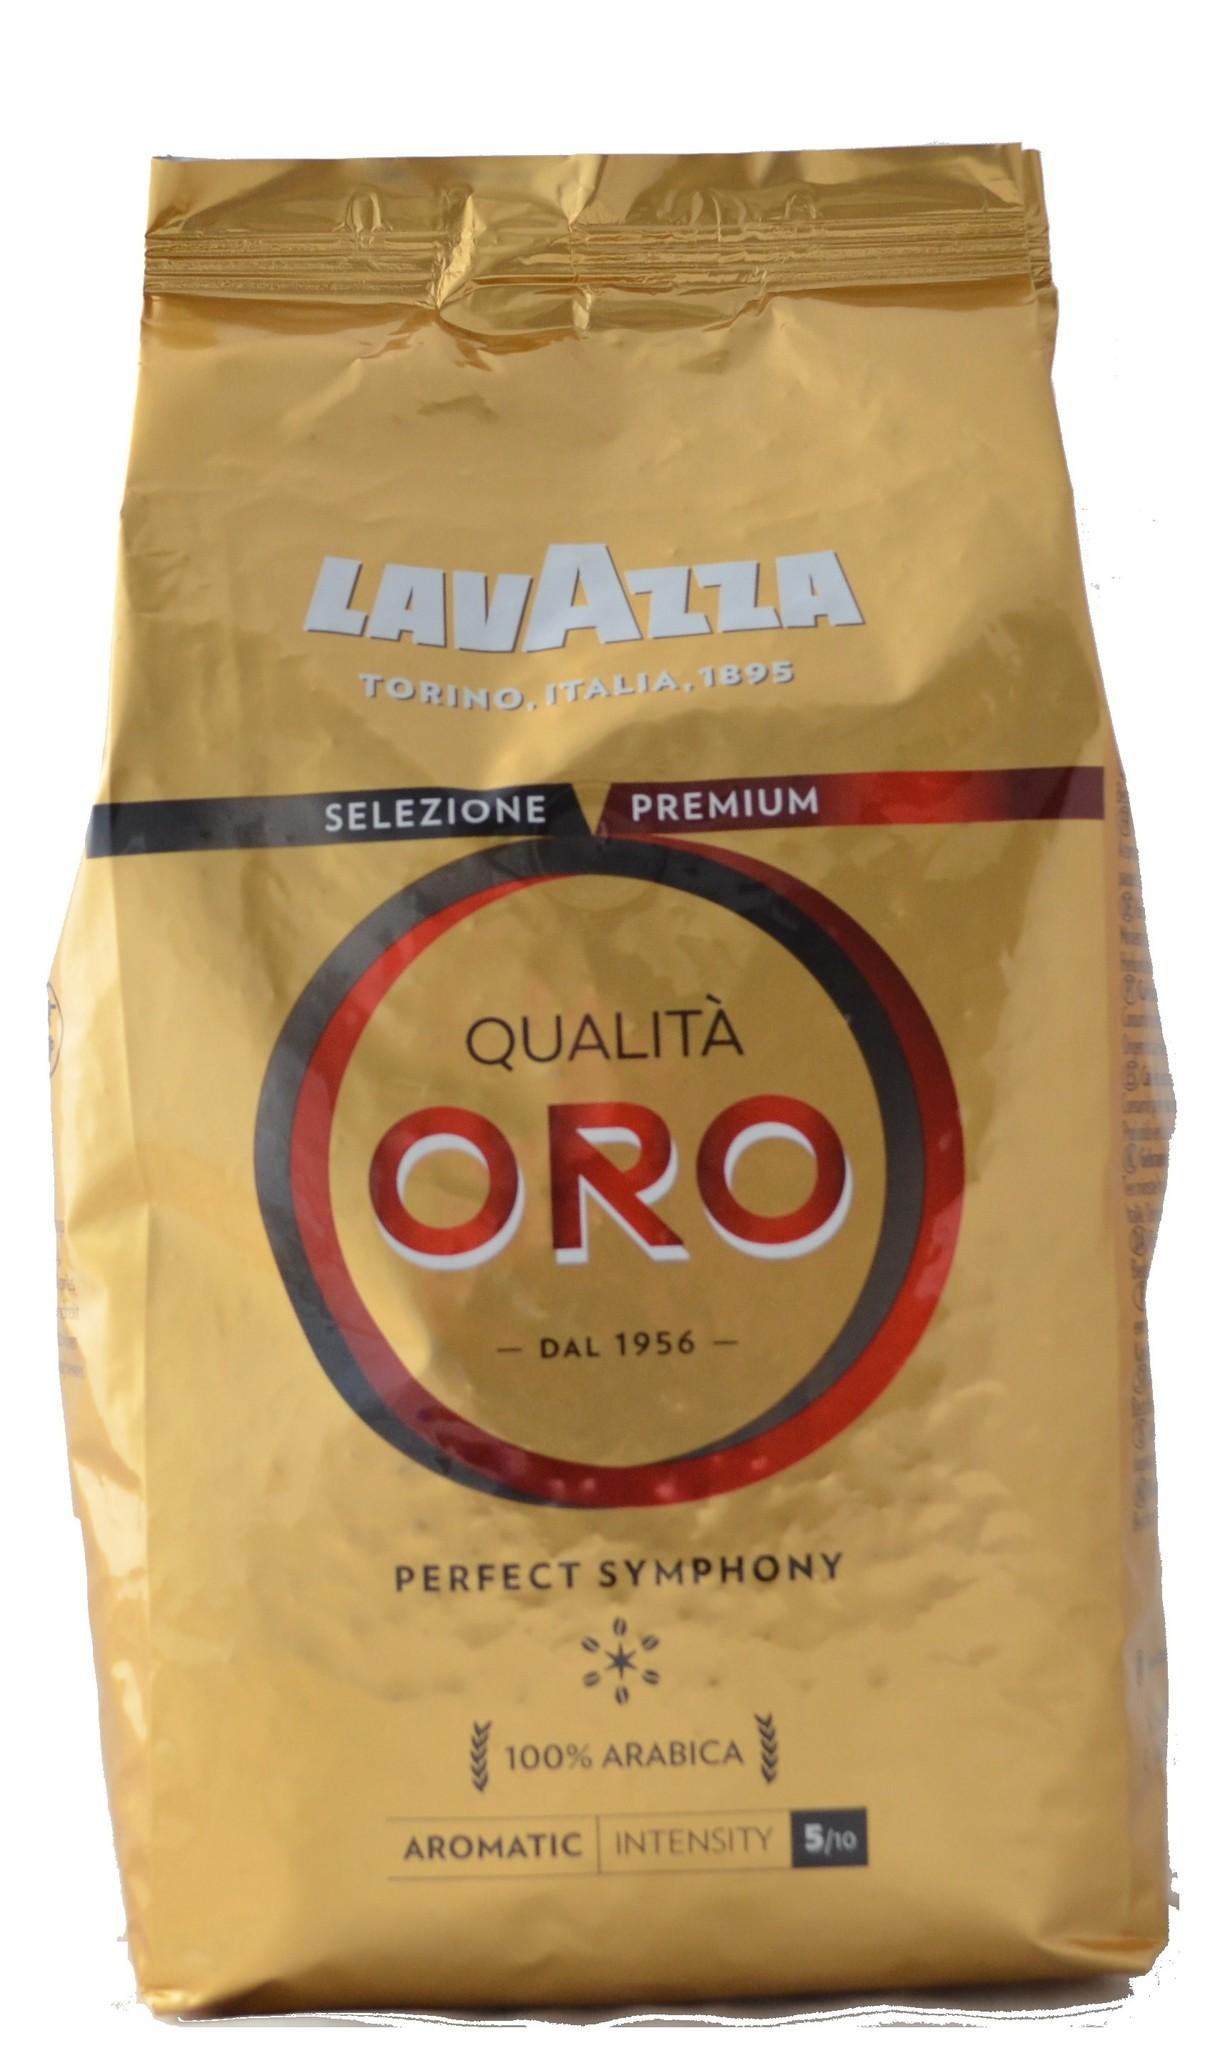 Lavazza Qualita Oro bonen 1 kg. vanaf € 11.50